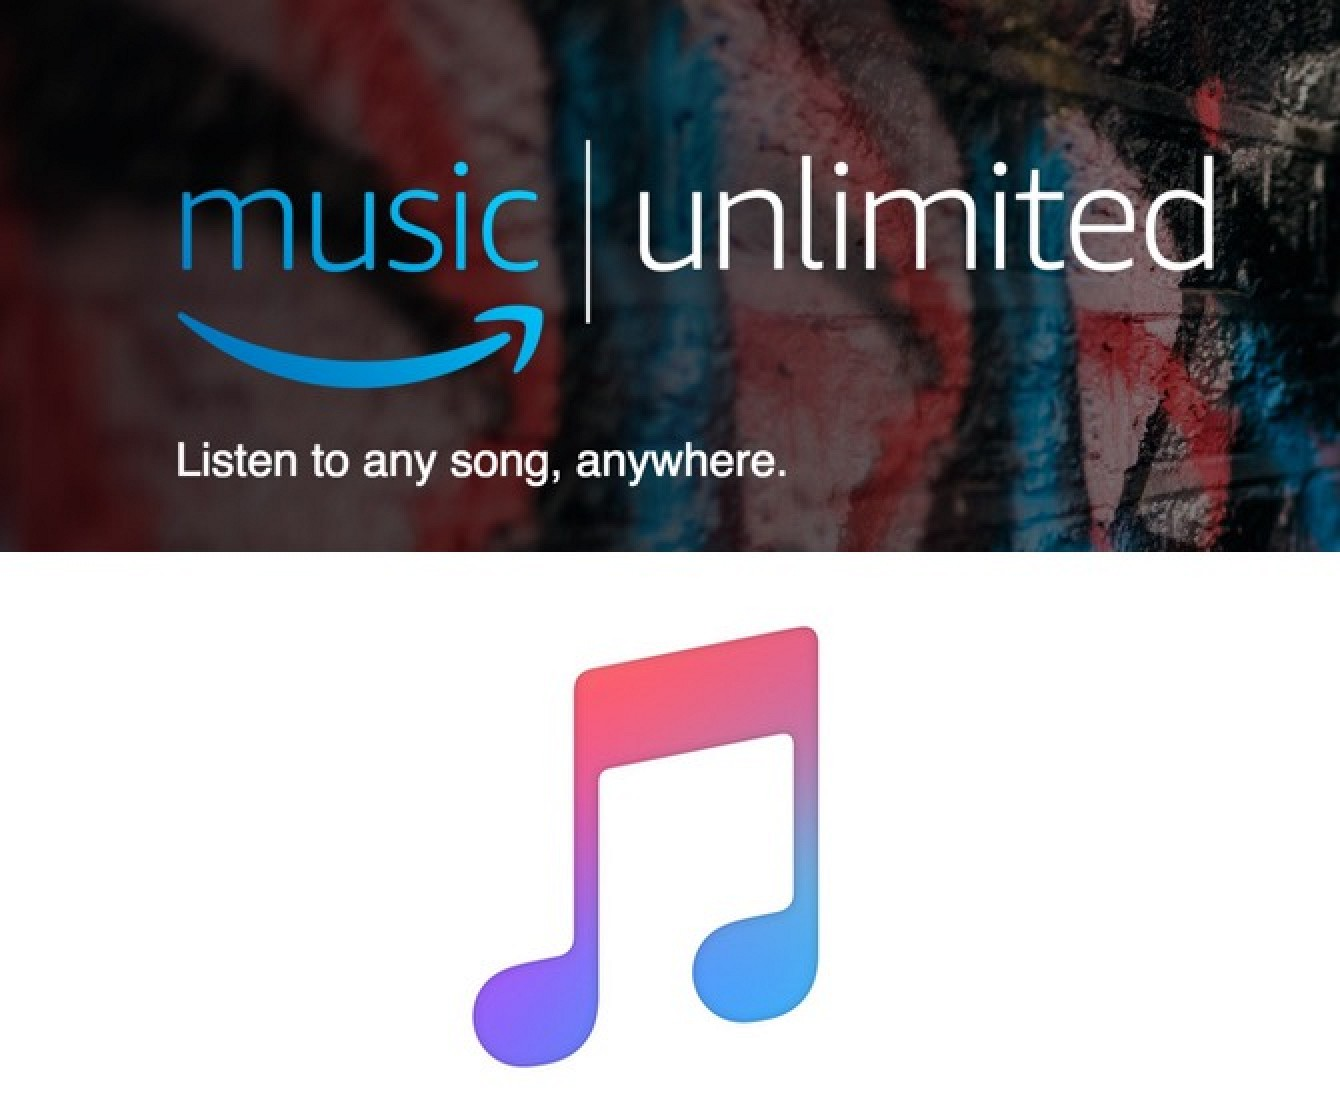 Apple Music Vs. Amazon Music Unlimited